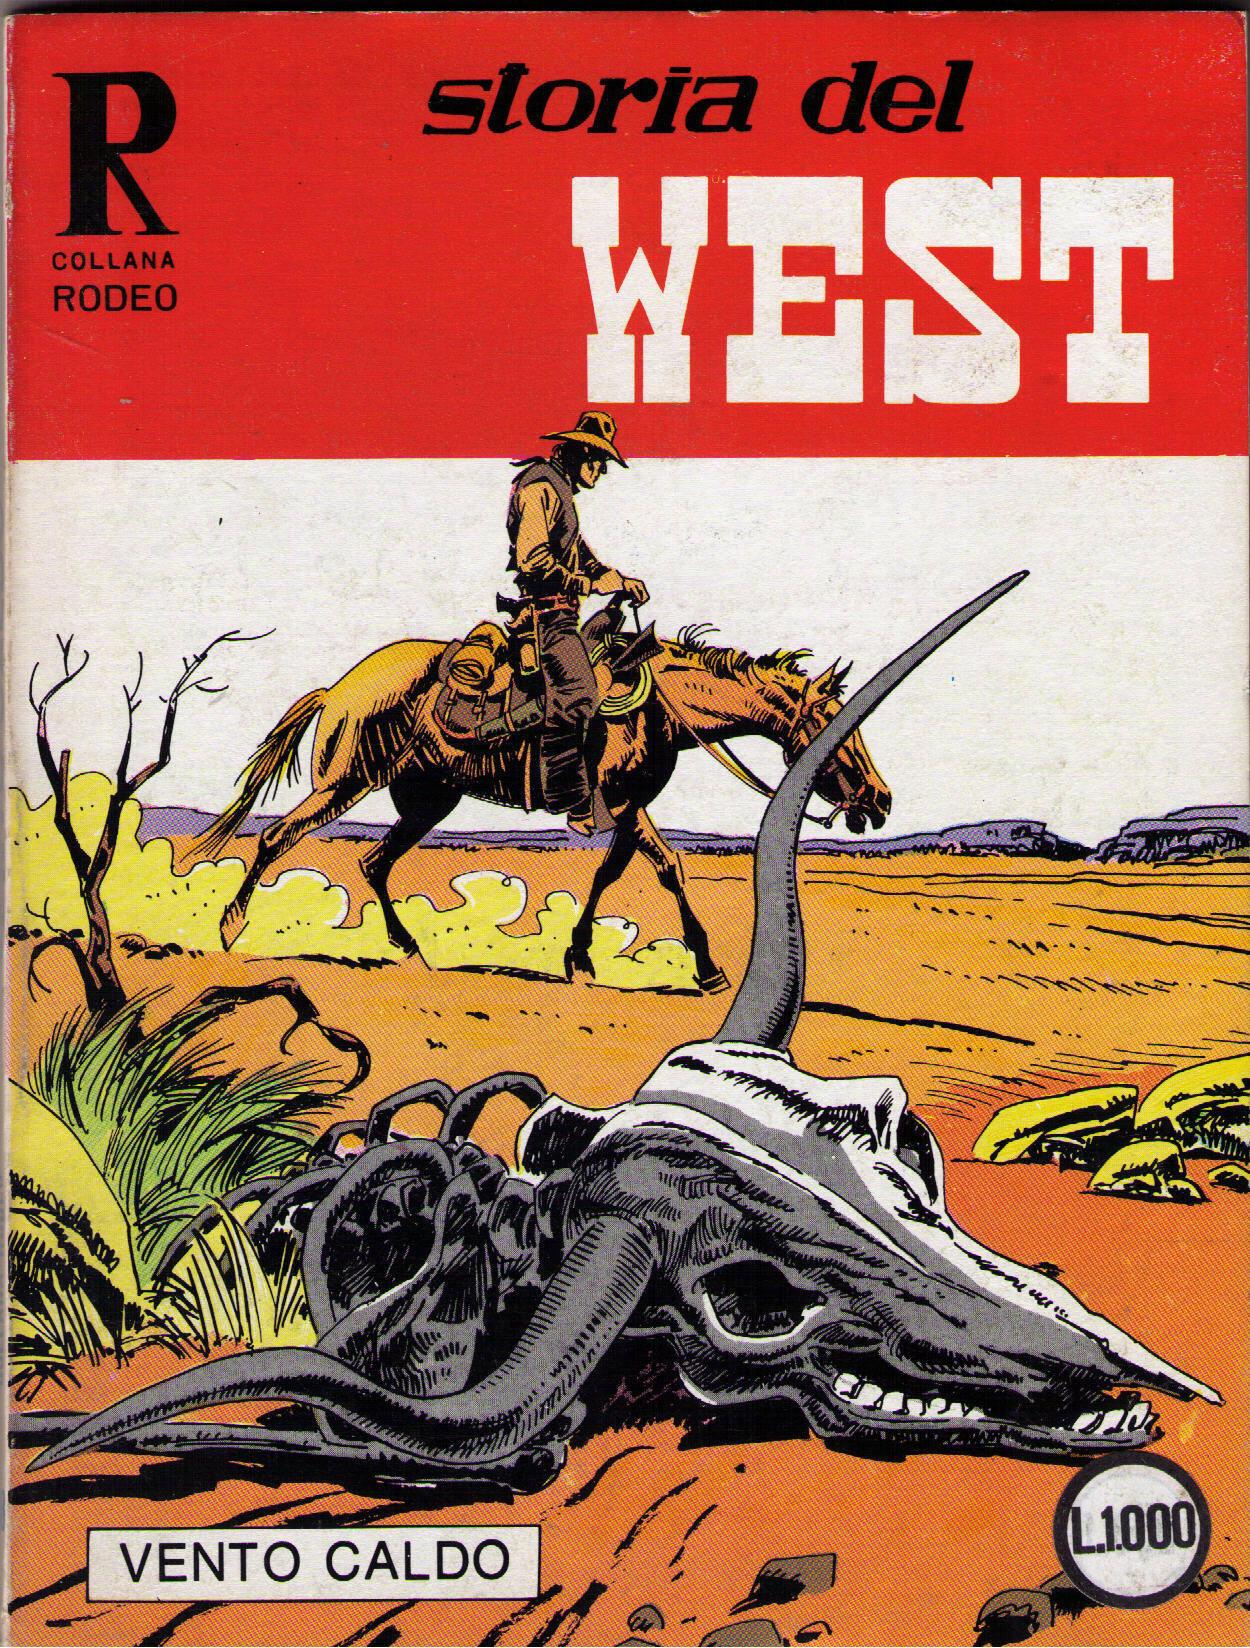 Storia del West n. 70 (Collana Rodeo n. 158)